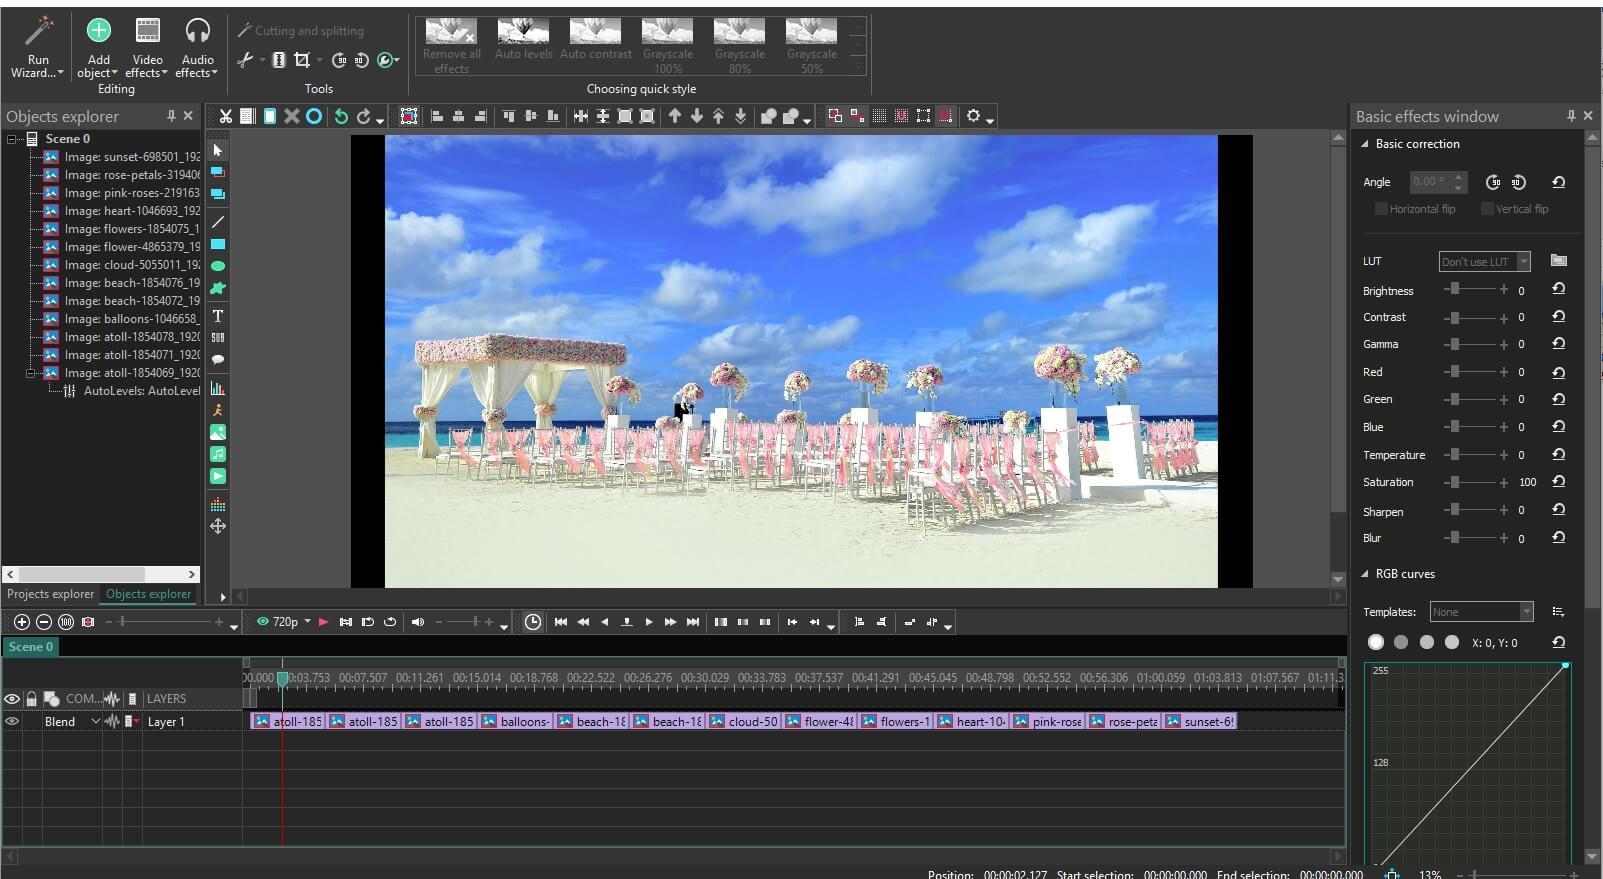 VSDC Wedding Invitation Video Editing